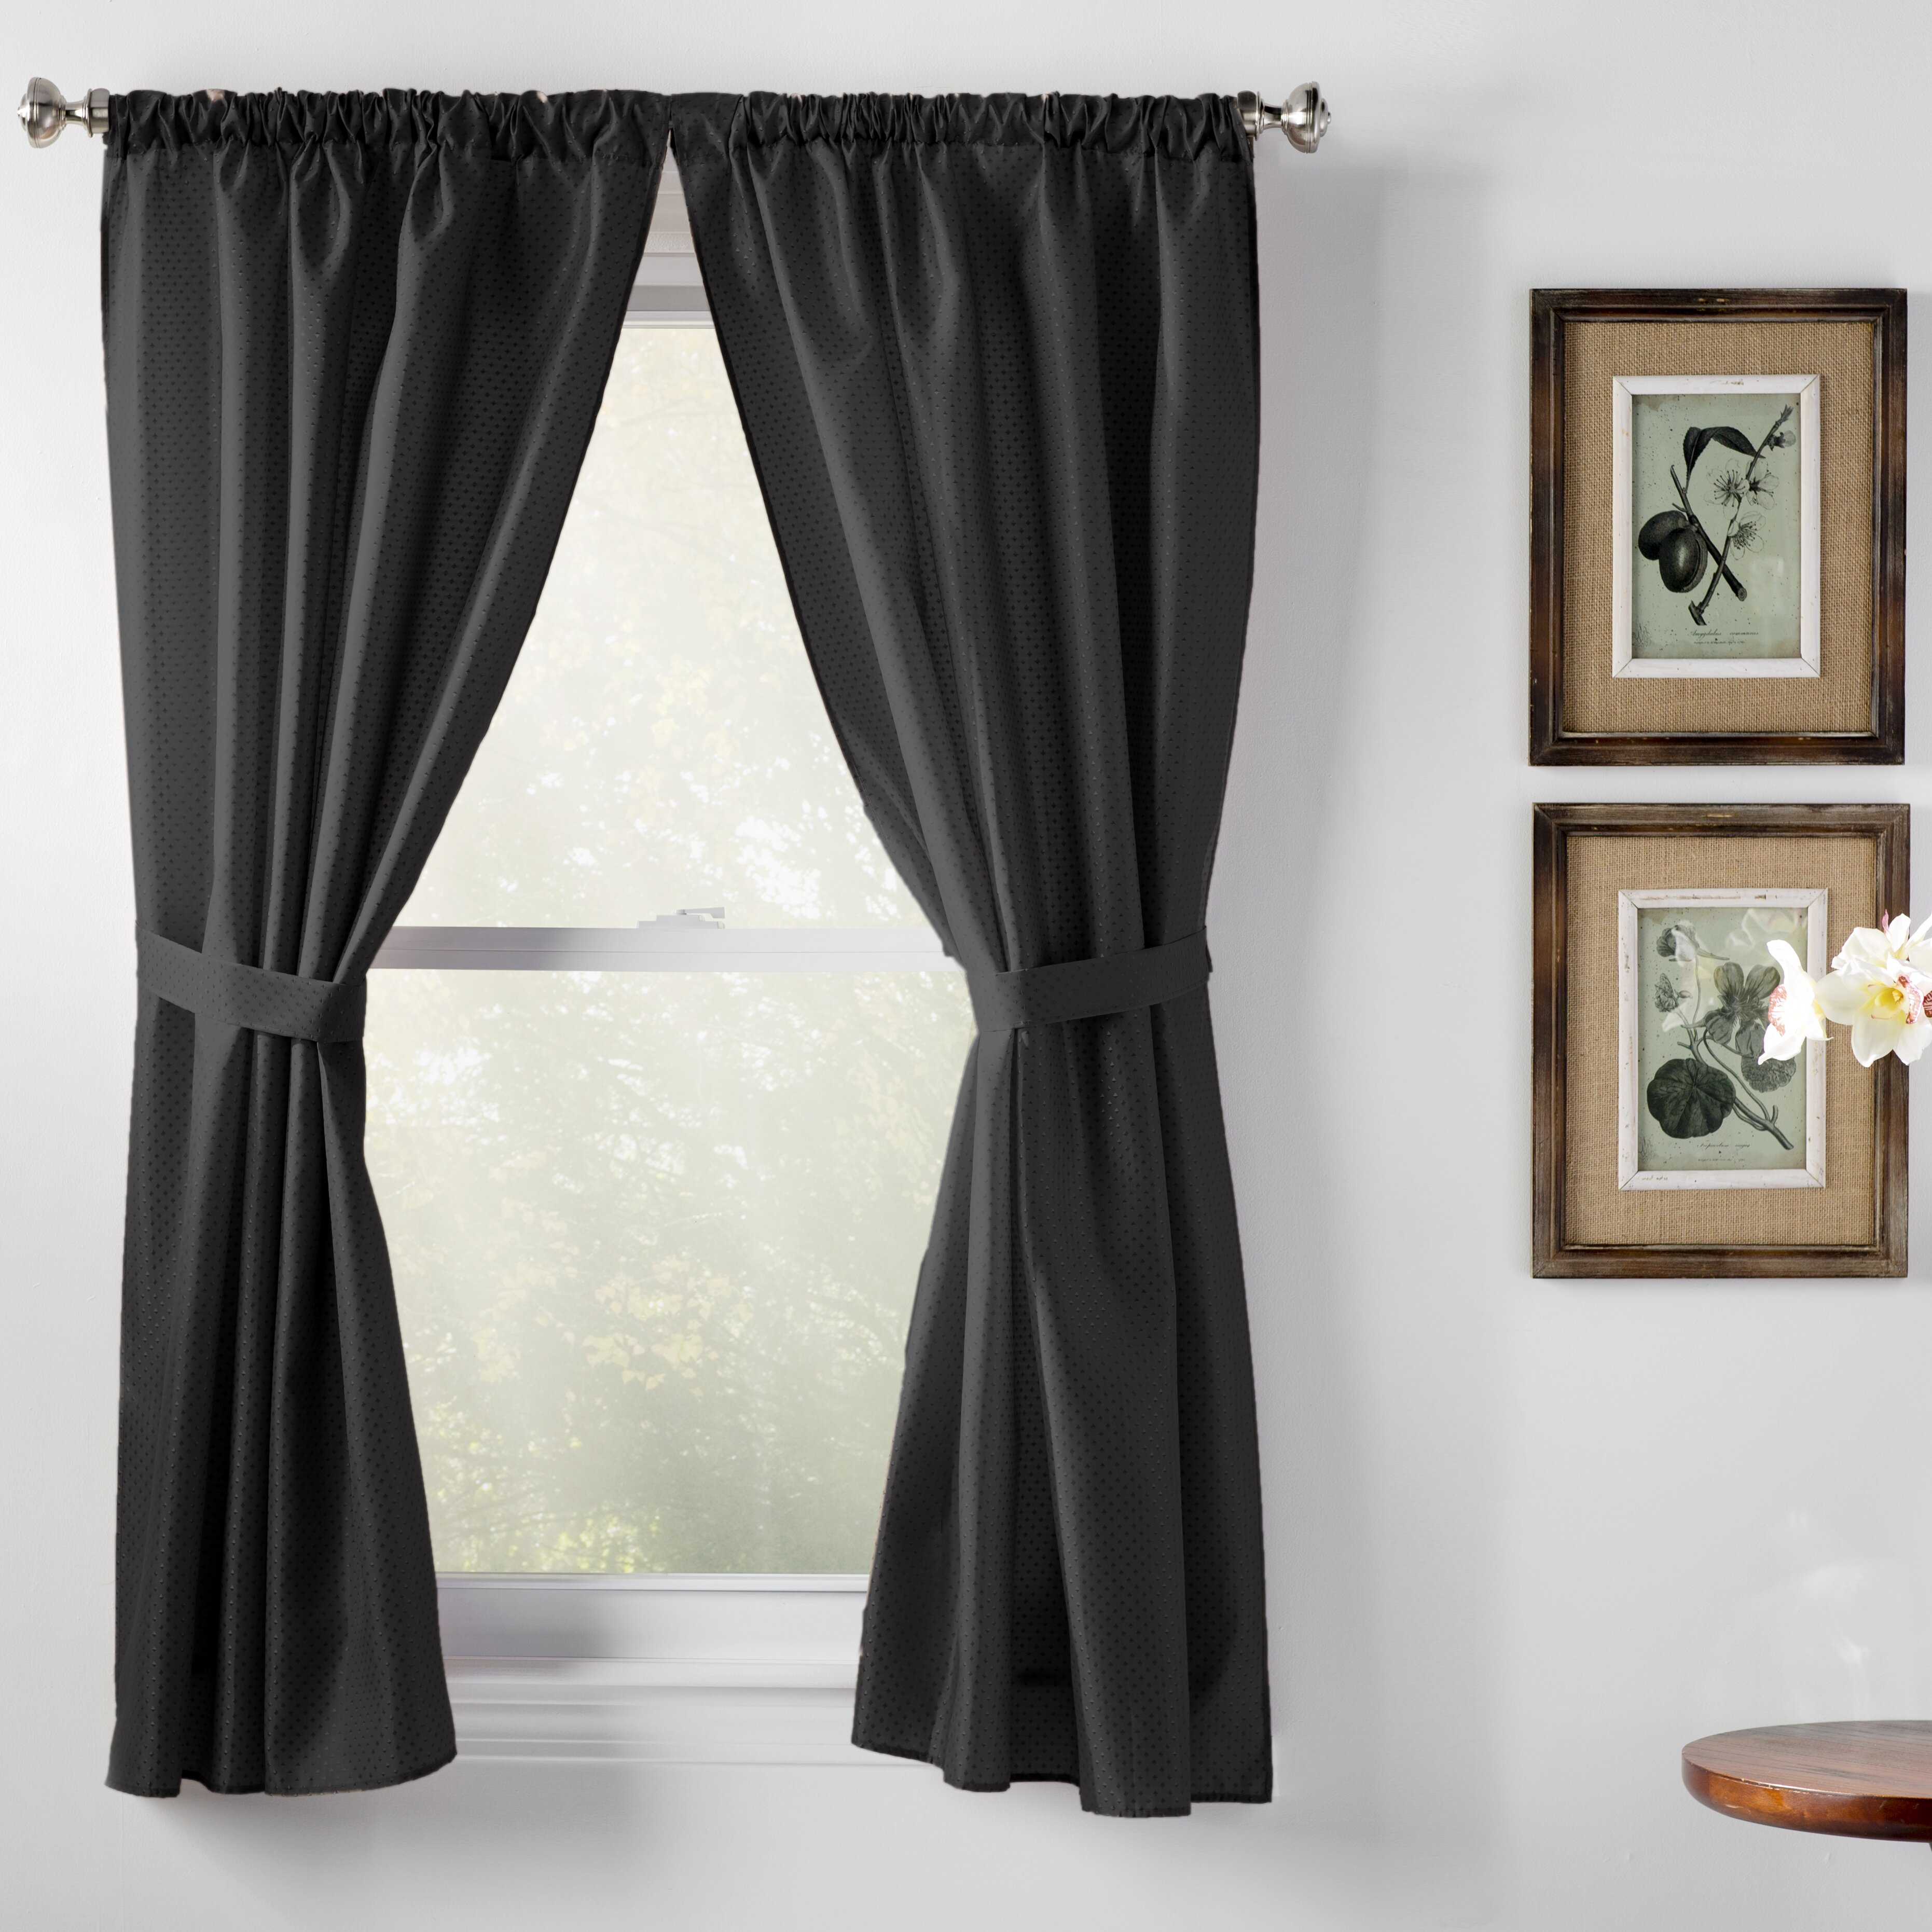 treatments curtains drapes 62 under curtains drapes w